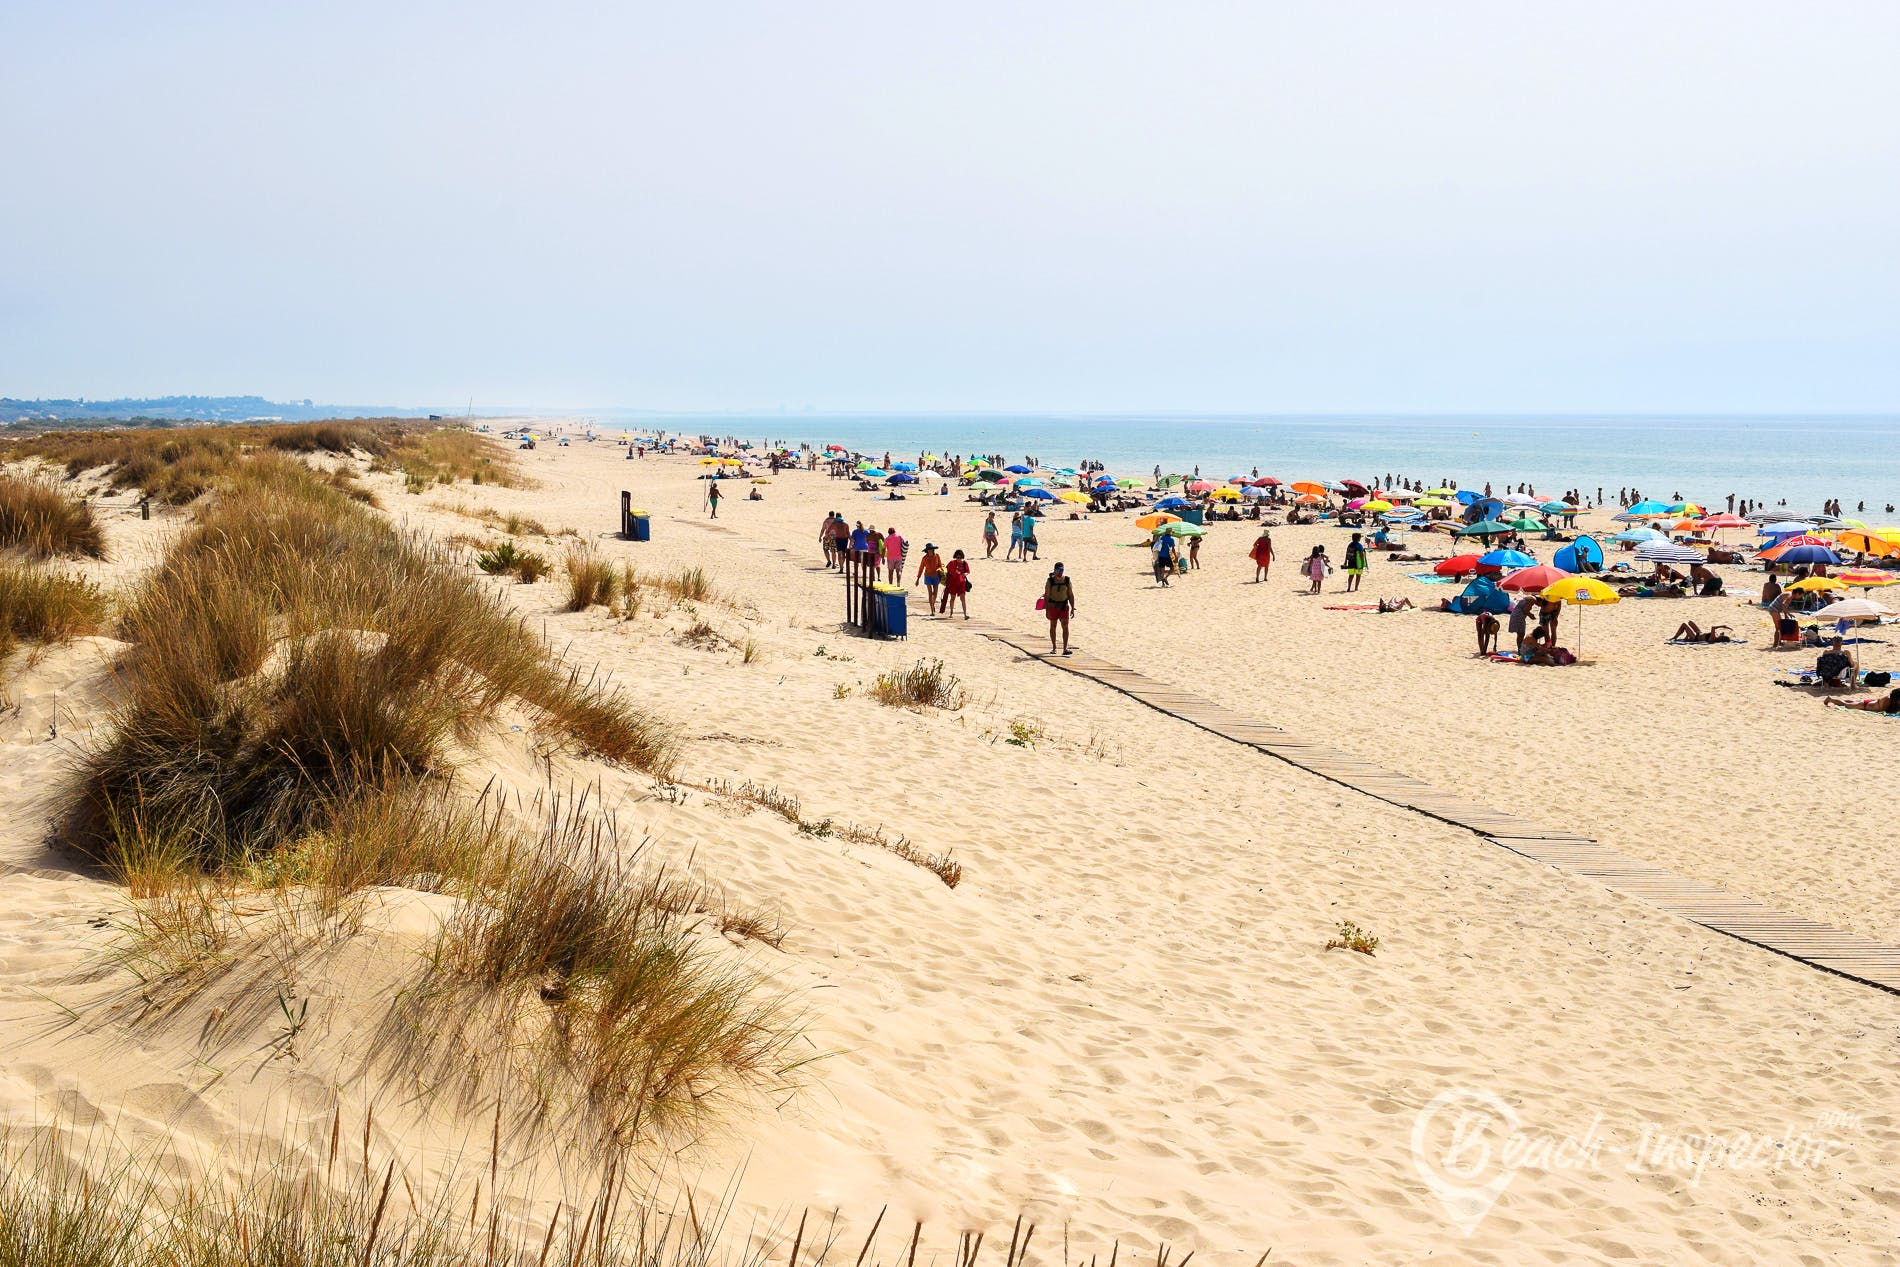 Playa Praia das Cabanas, Algarve, Portugal